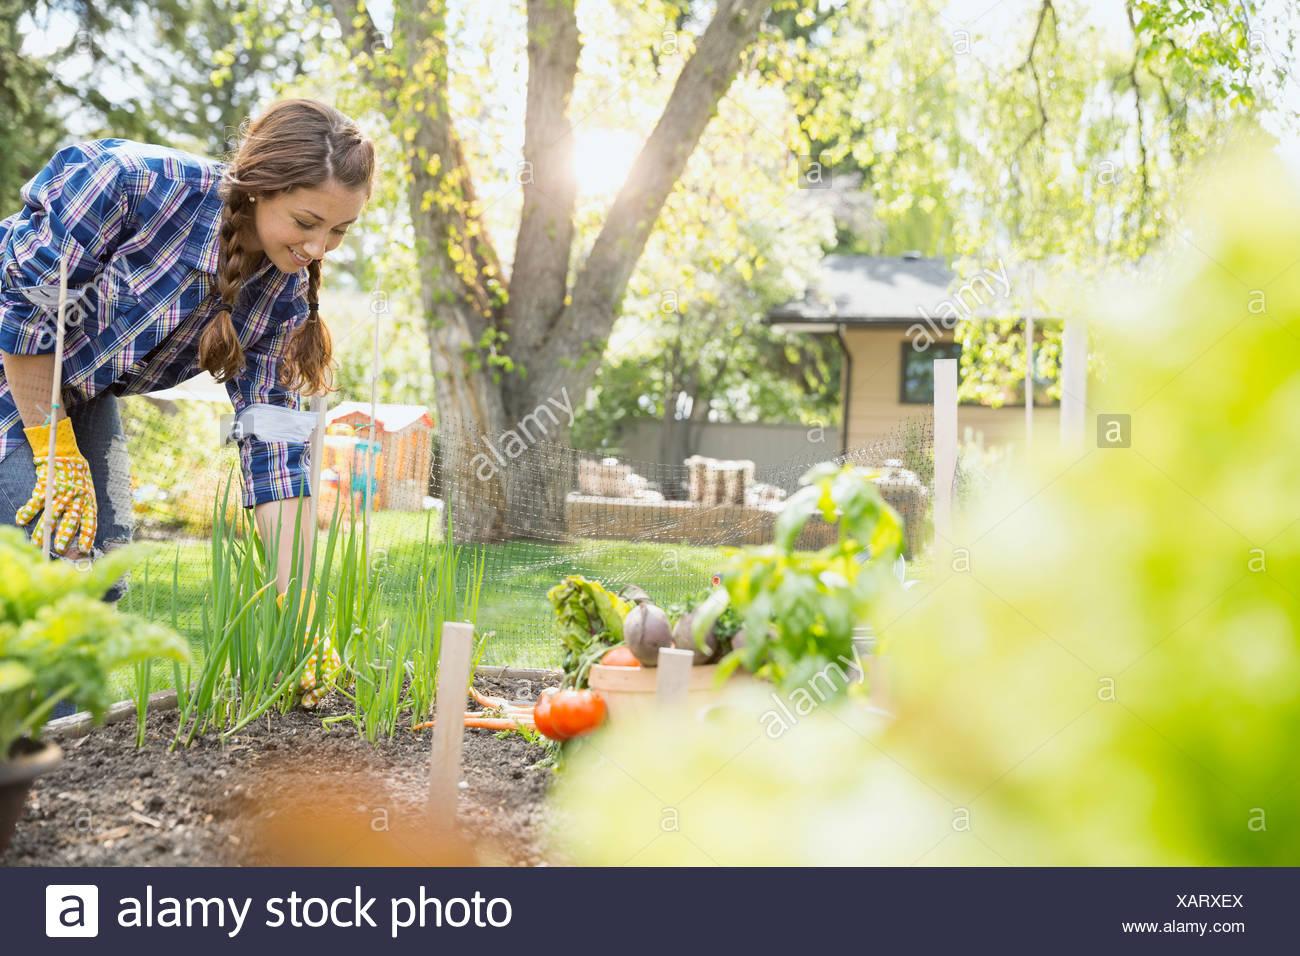 Woman tending to vegetable garden - Stock Image